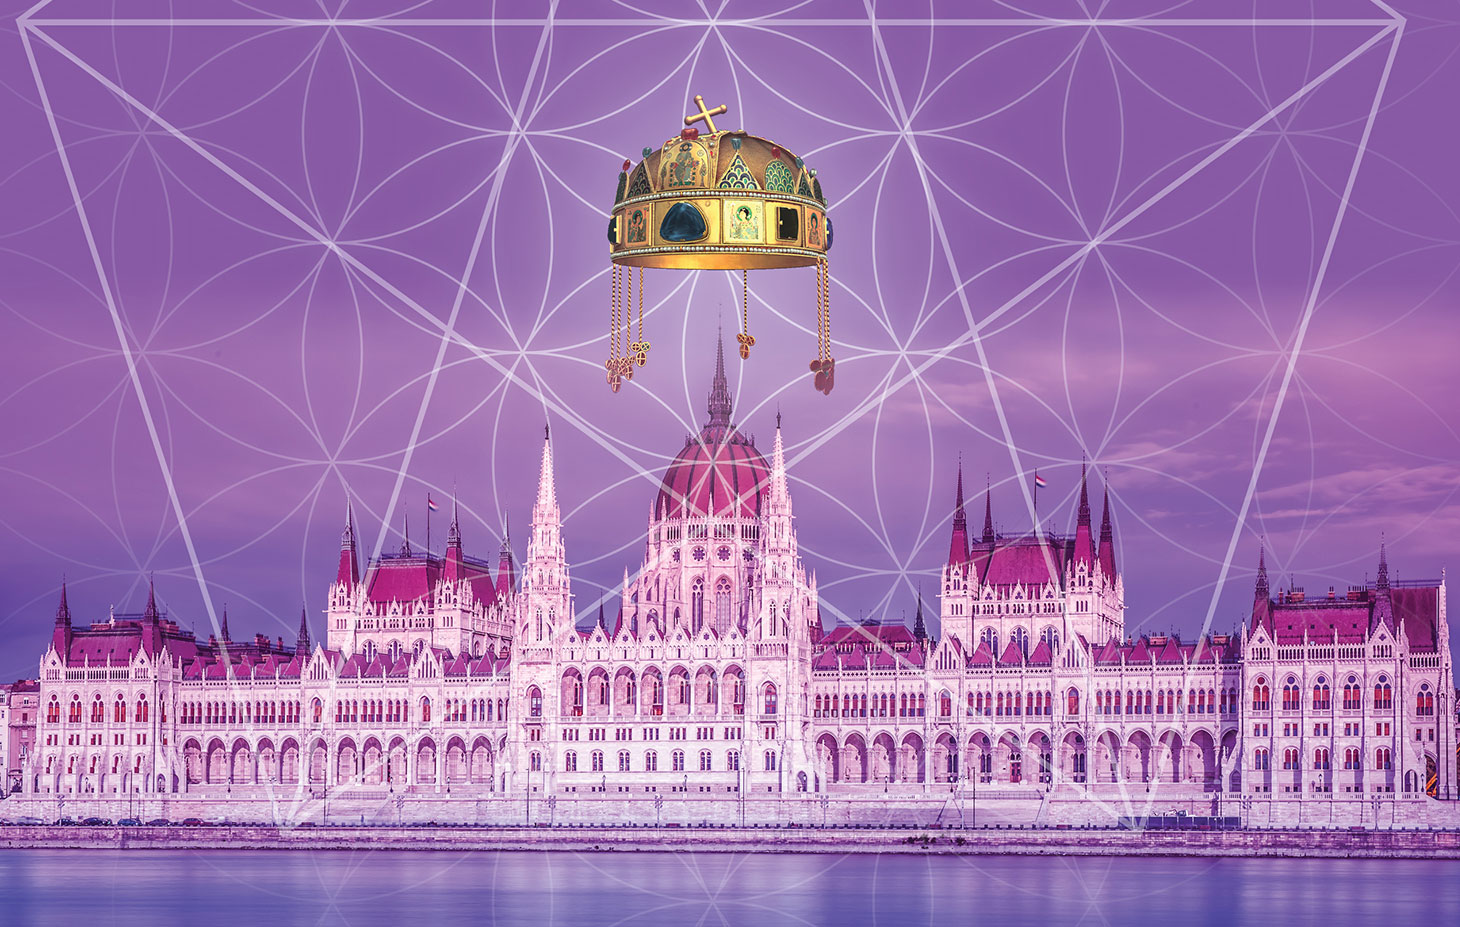 szakralis-geometria-parlament